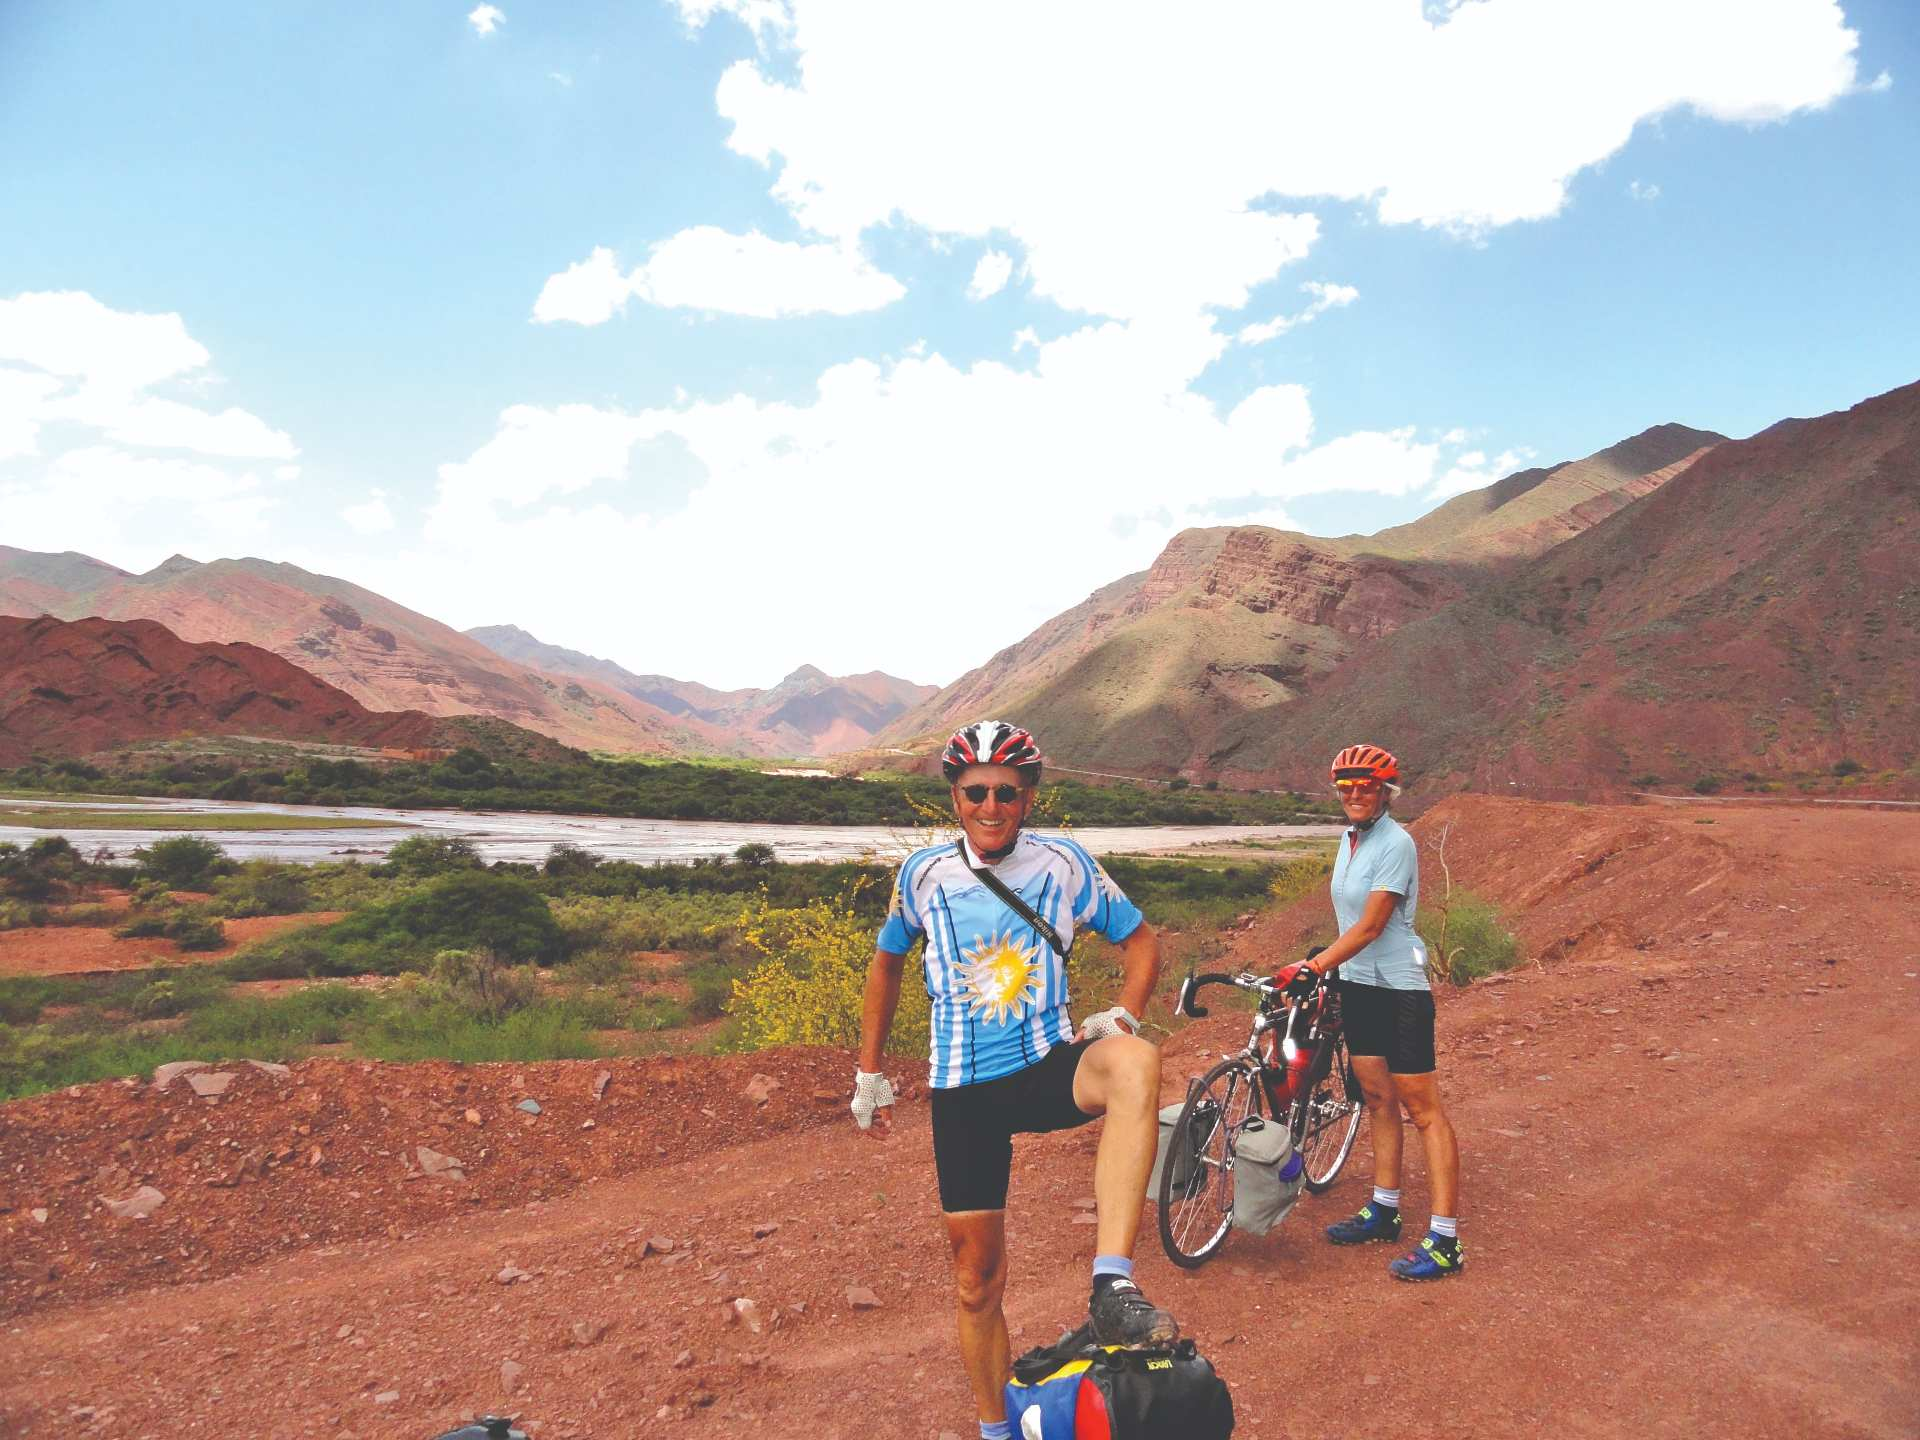 Patagonia, South America, epic cycling trip